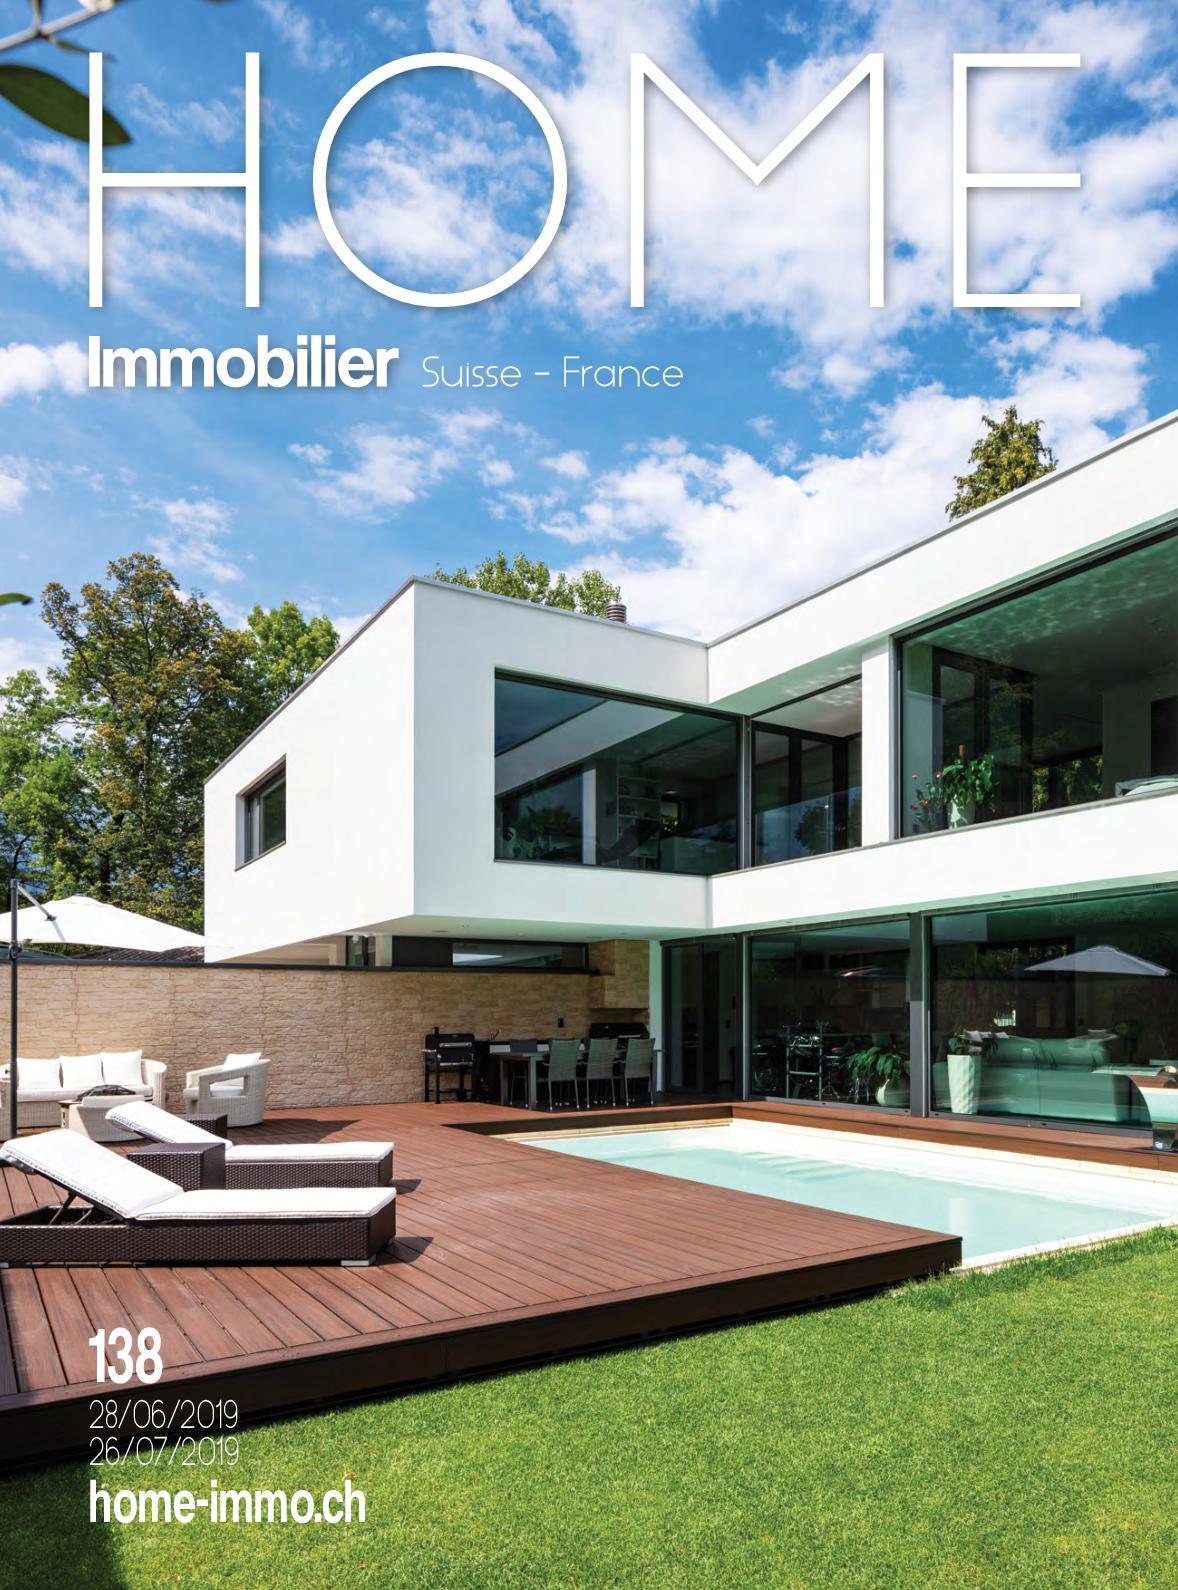 Vie Et Veranda Thoiry calaméo - magazine home immobilier n°138 france annecy